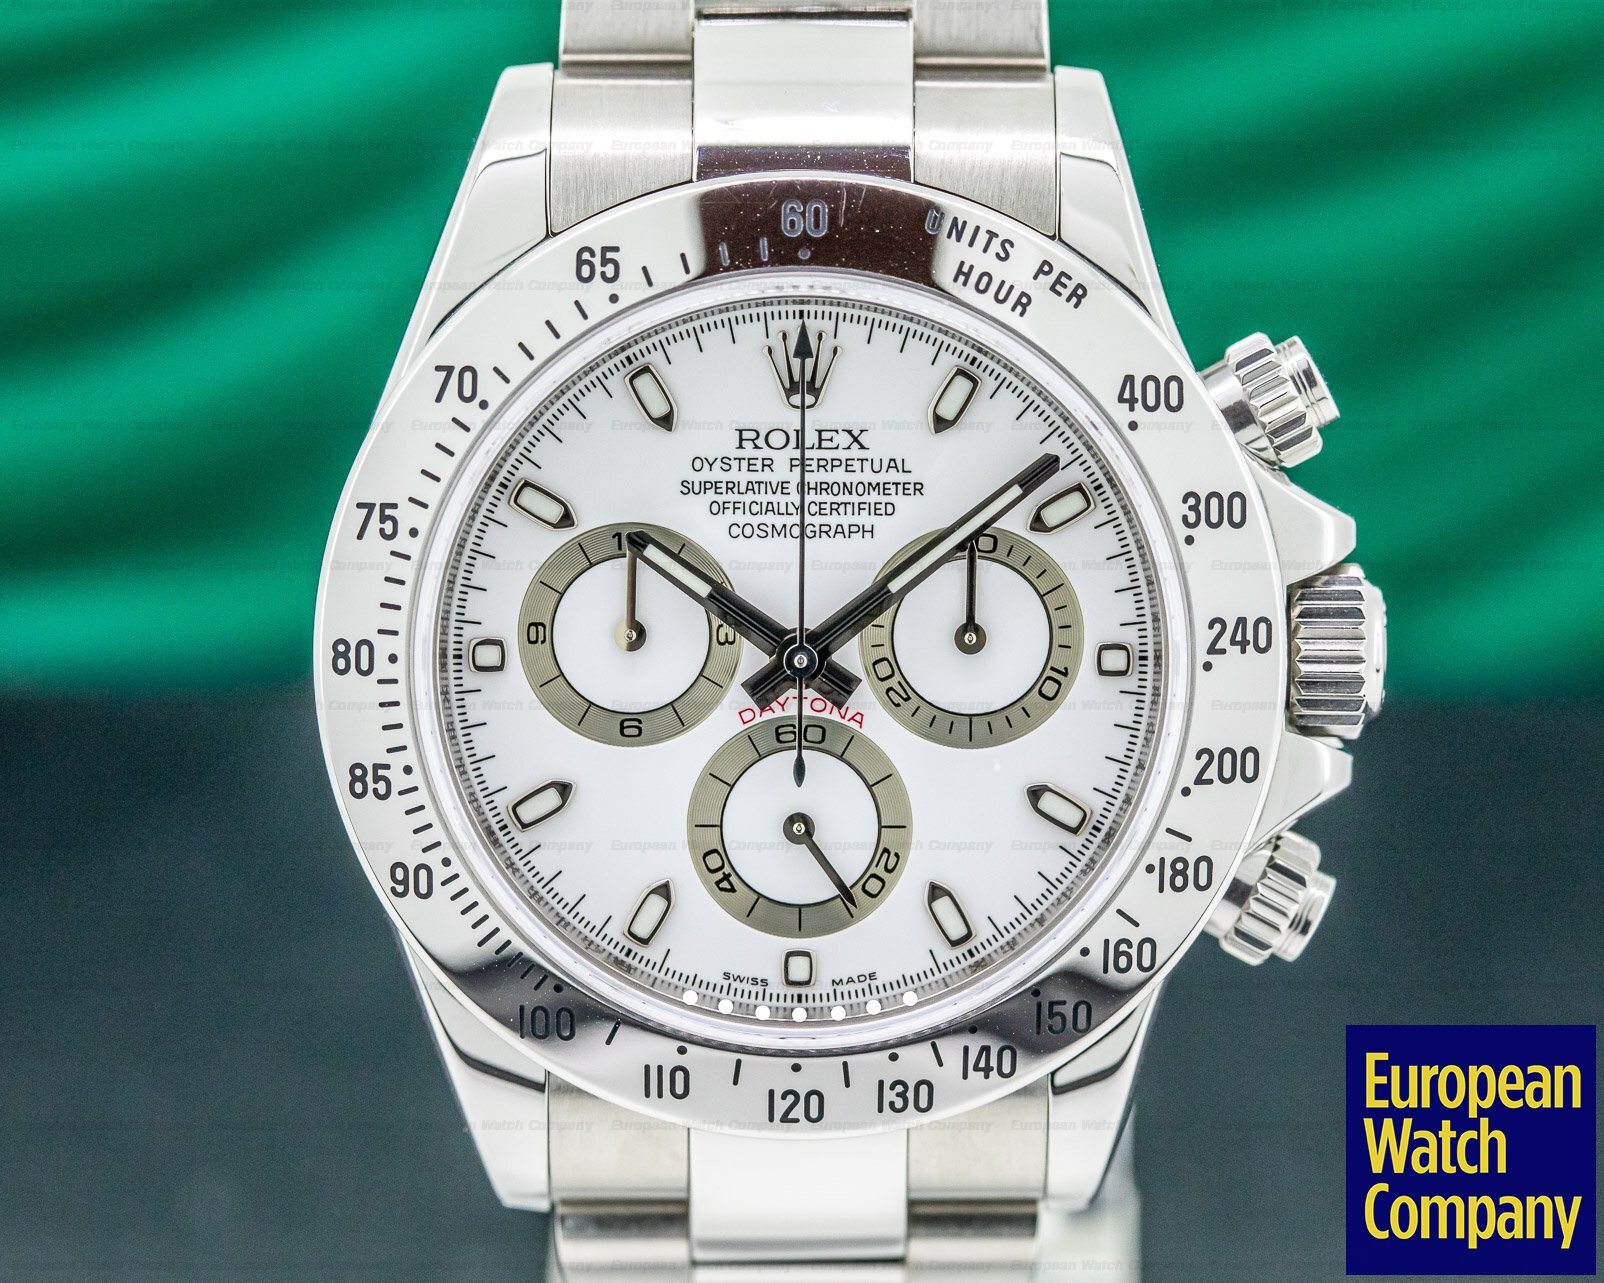 Rolex 116520 Daytona White Dial SS / SS FULL SET PERFECT